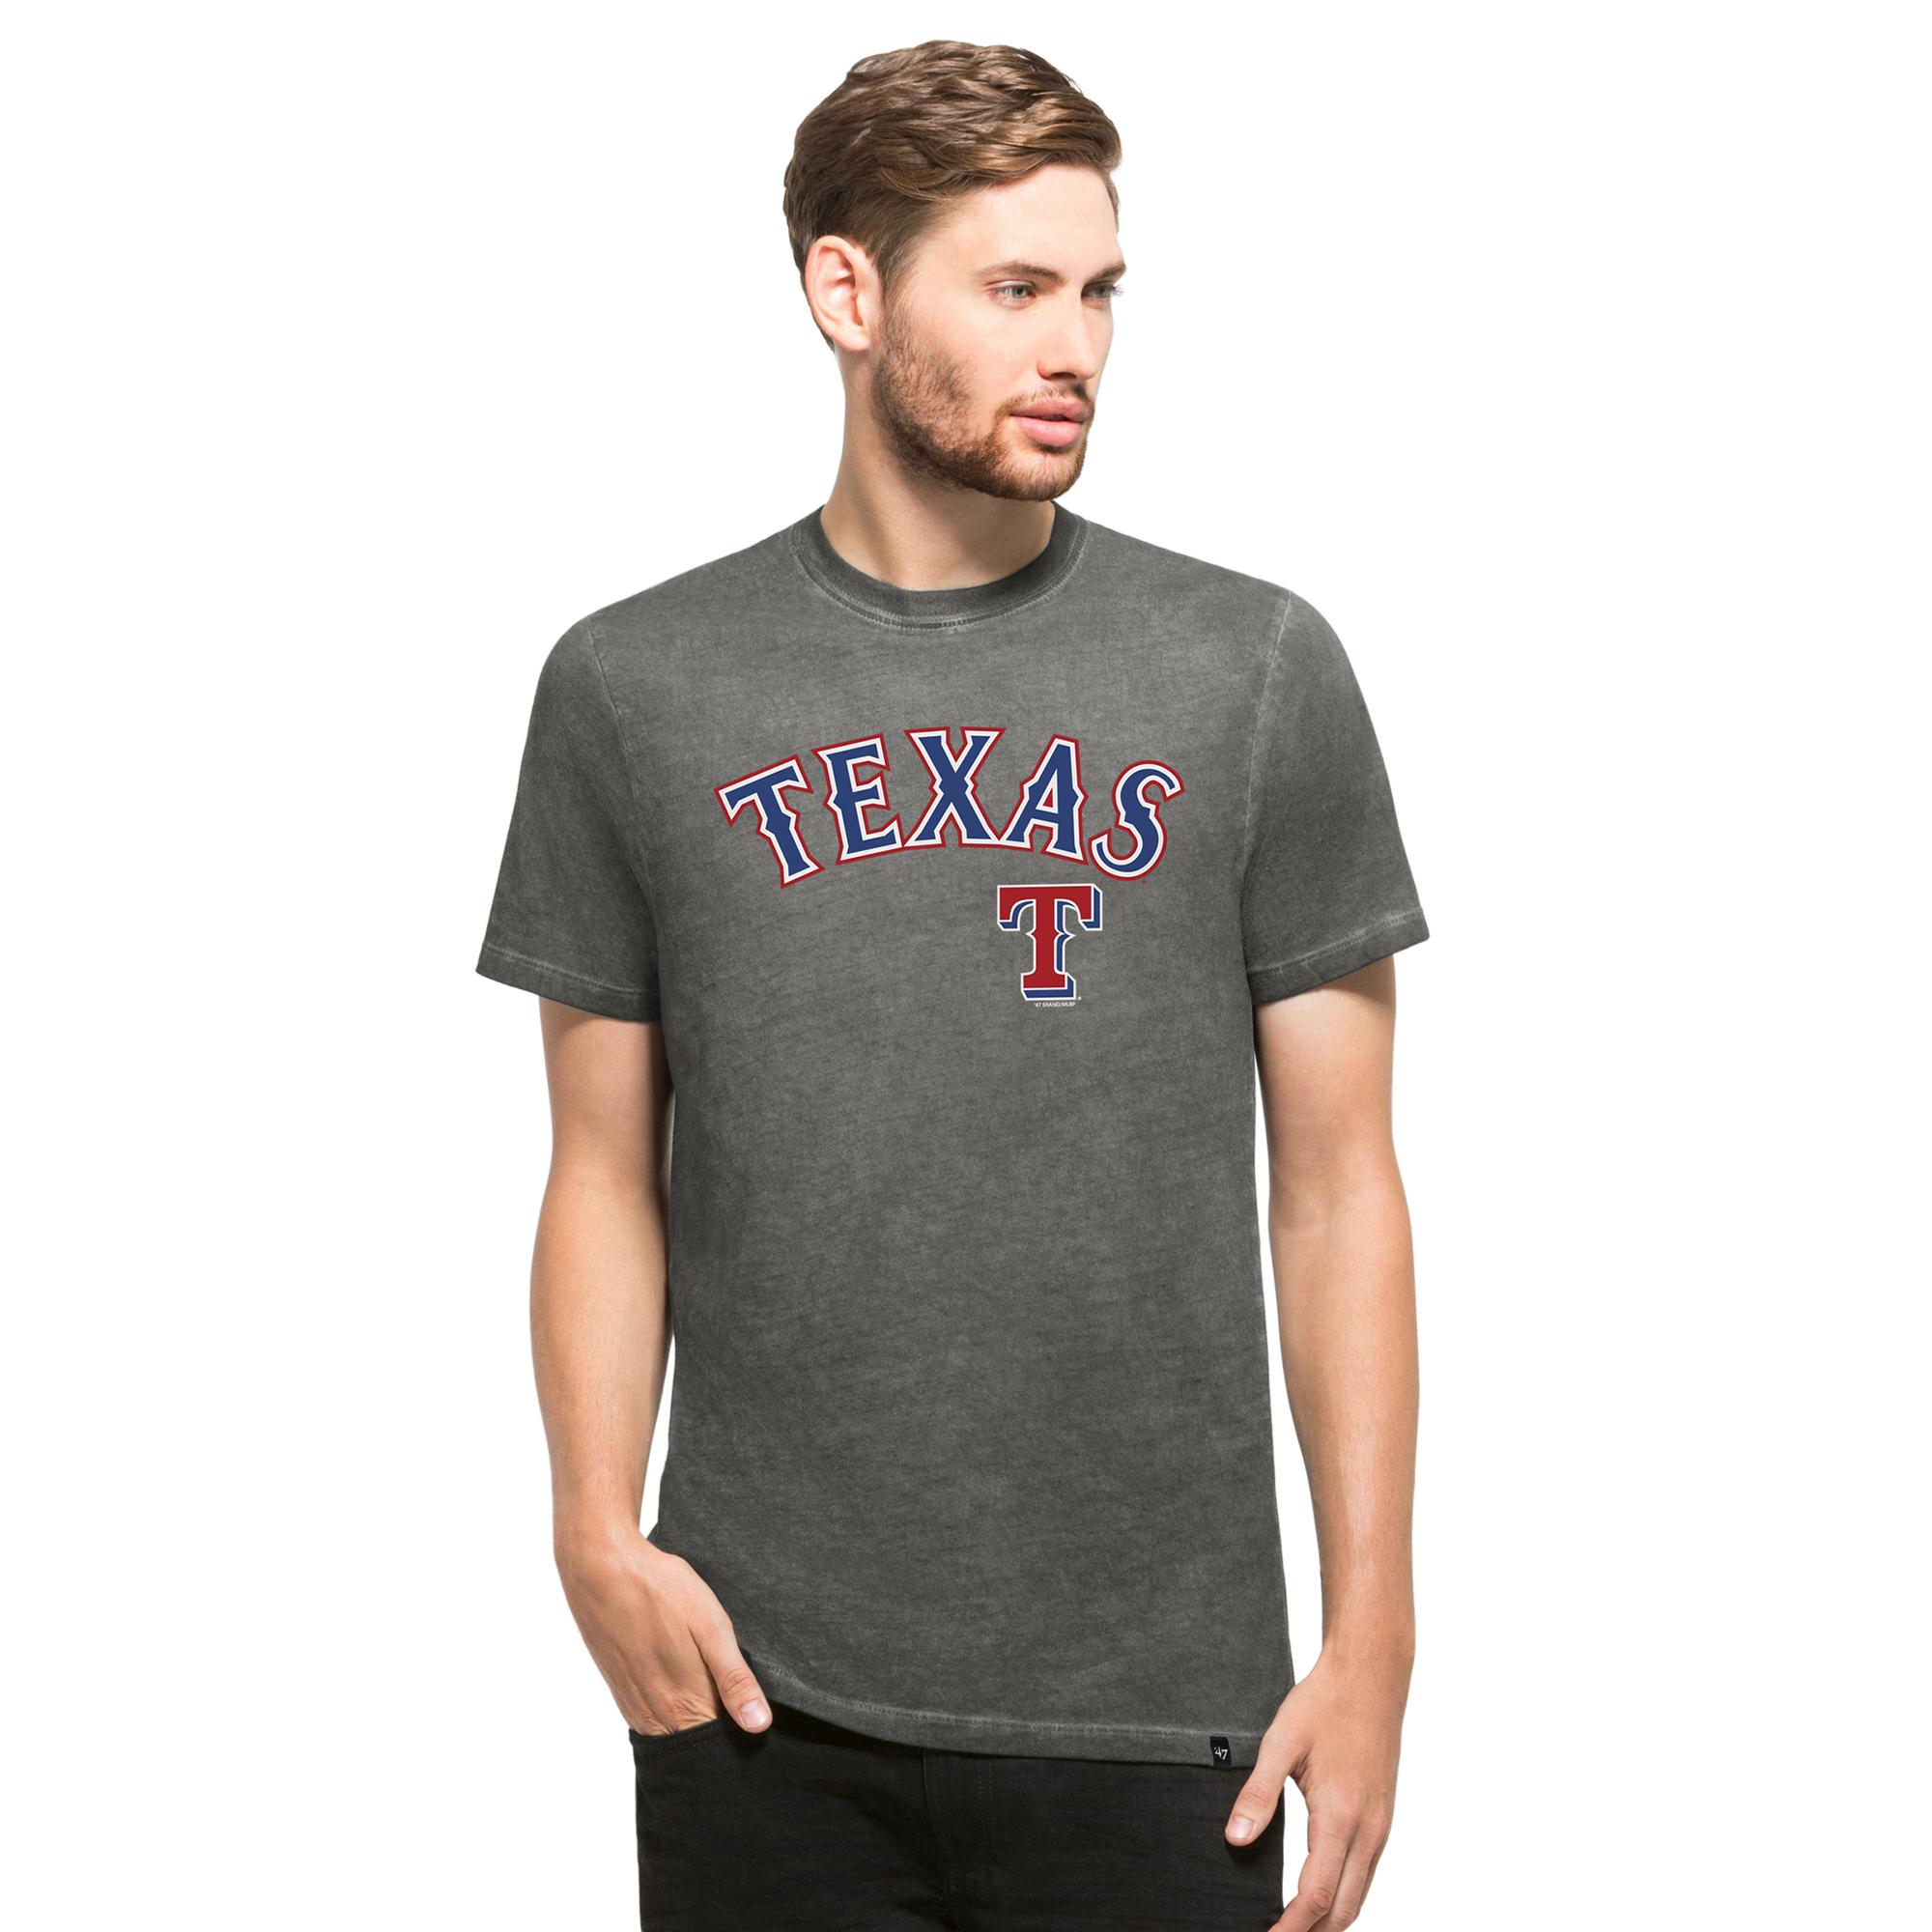 Texas Rangers '47 Reverb T-Shirt - Charcoal